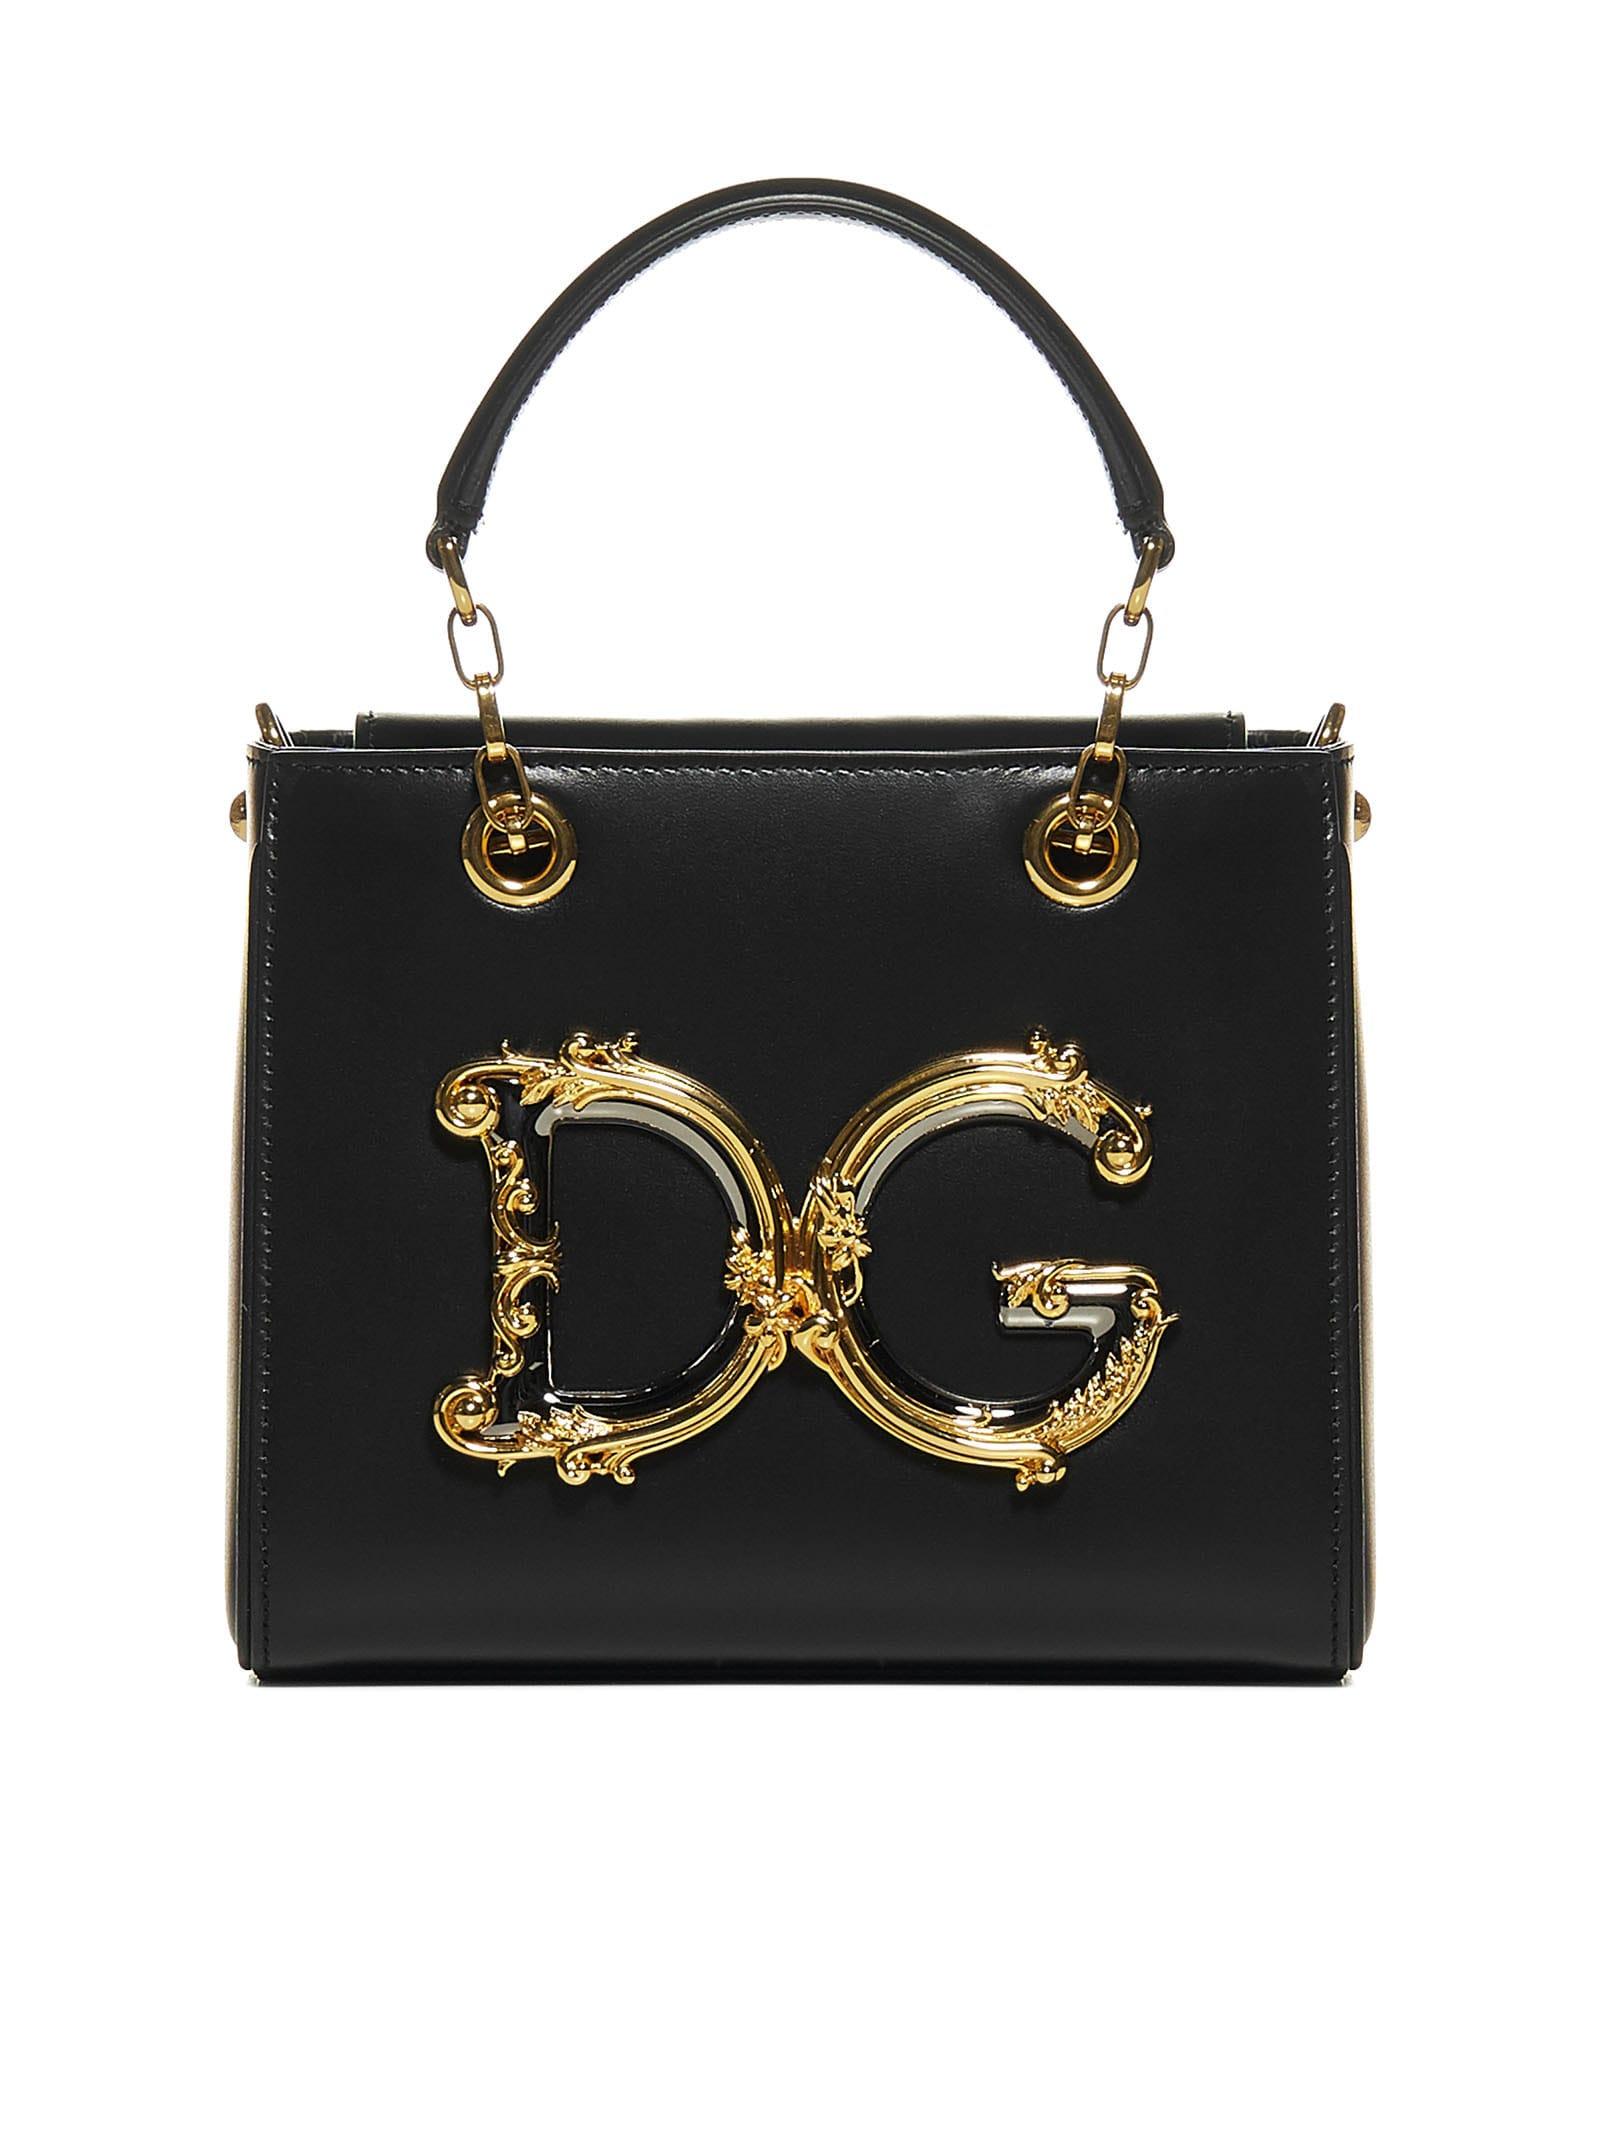 Dolce & Gabbana Tote In Nero